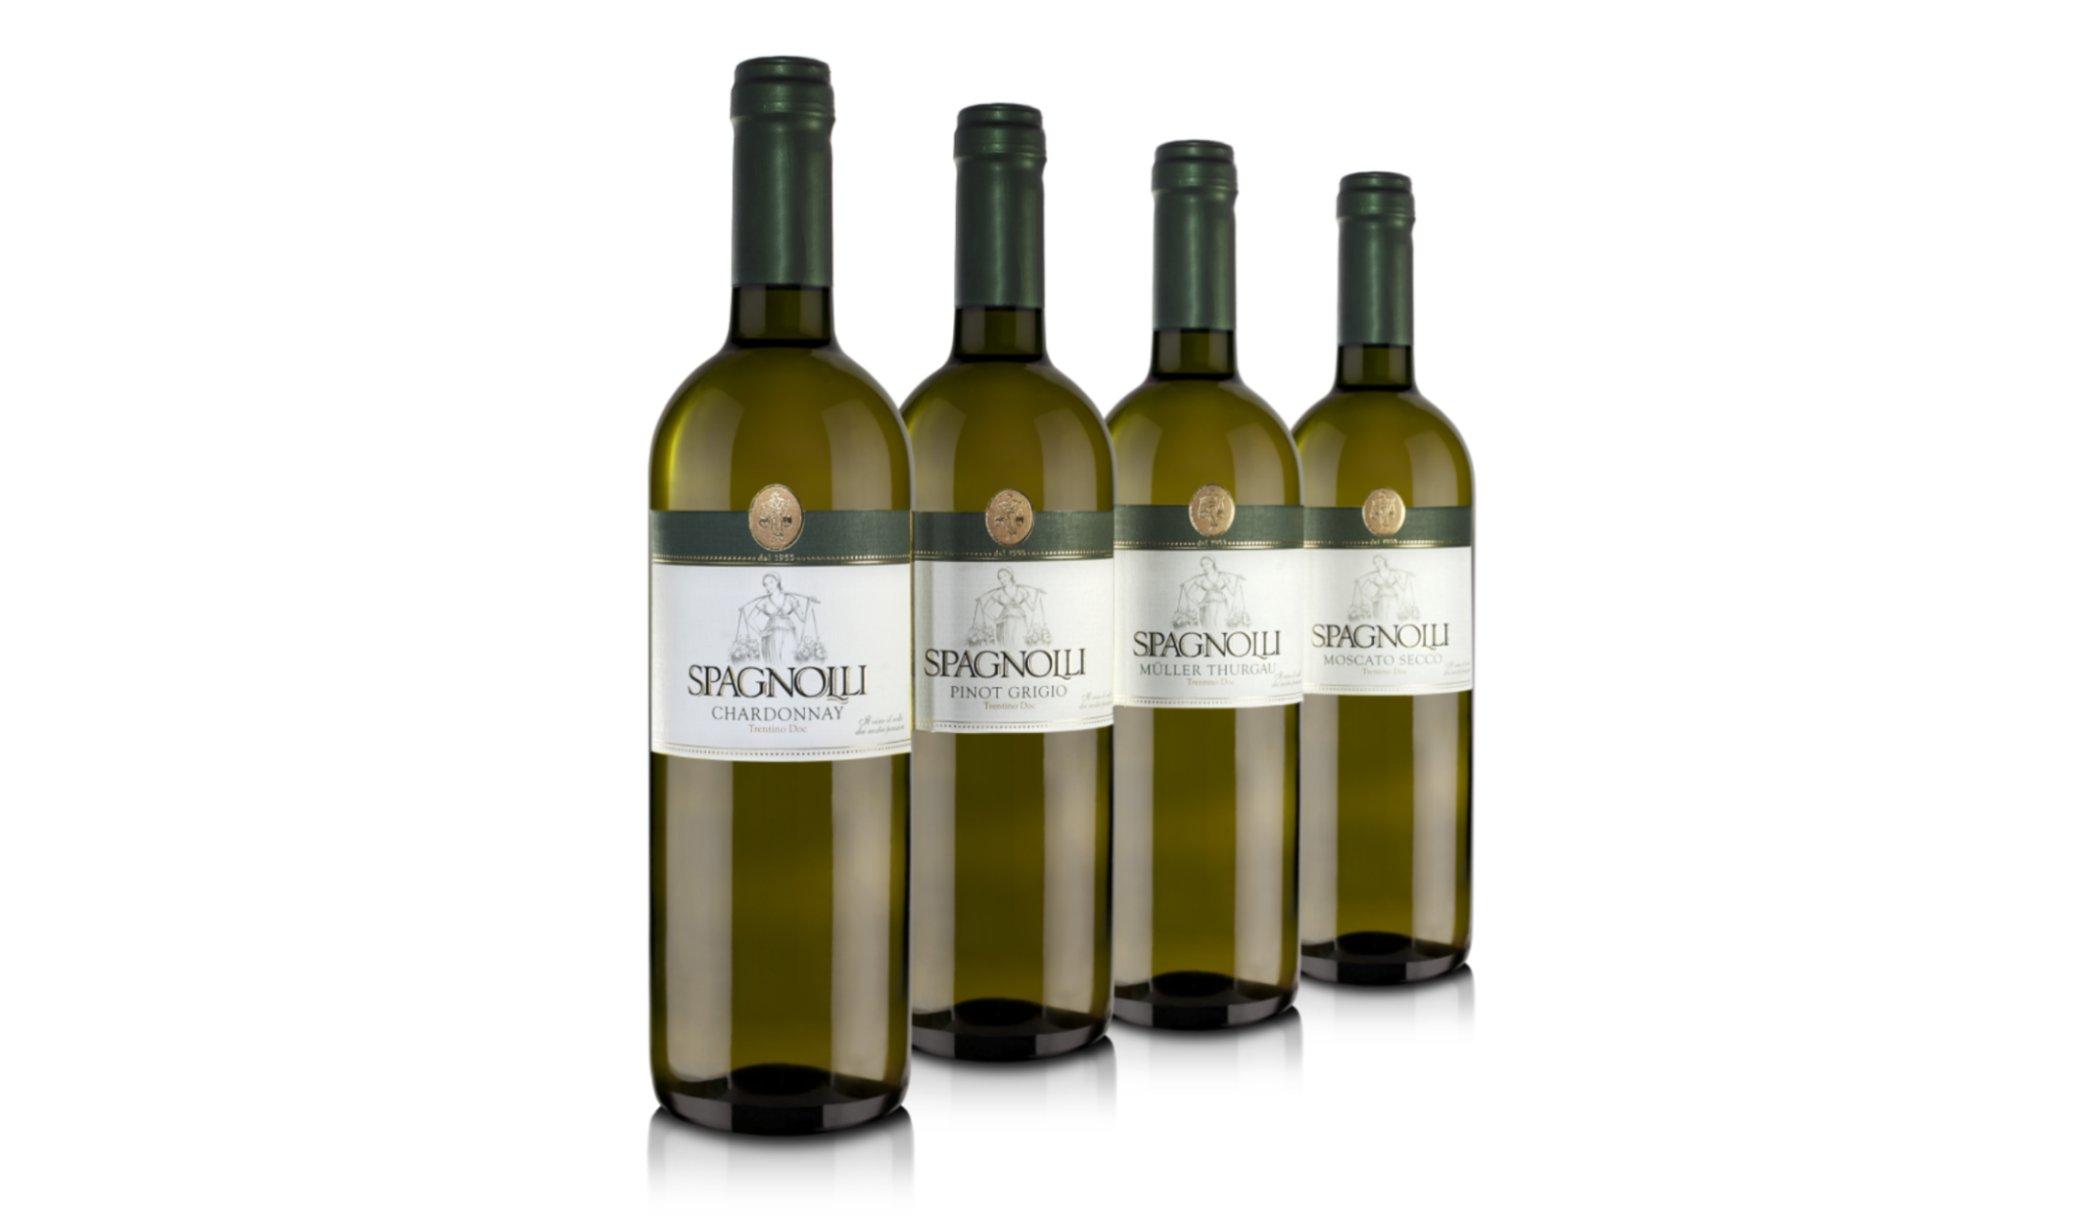 vini bianchi spagnolli trentino